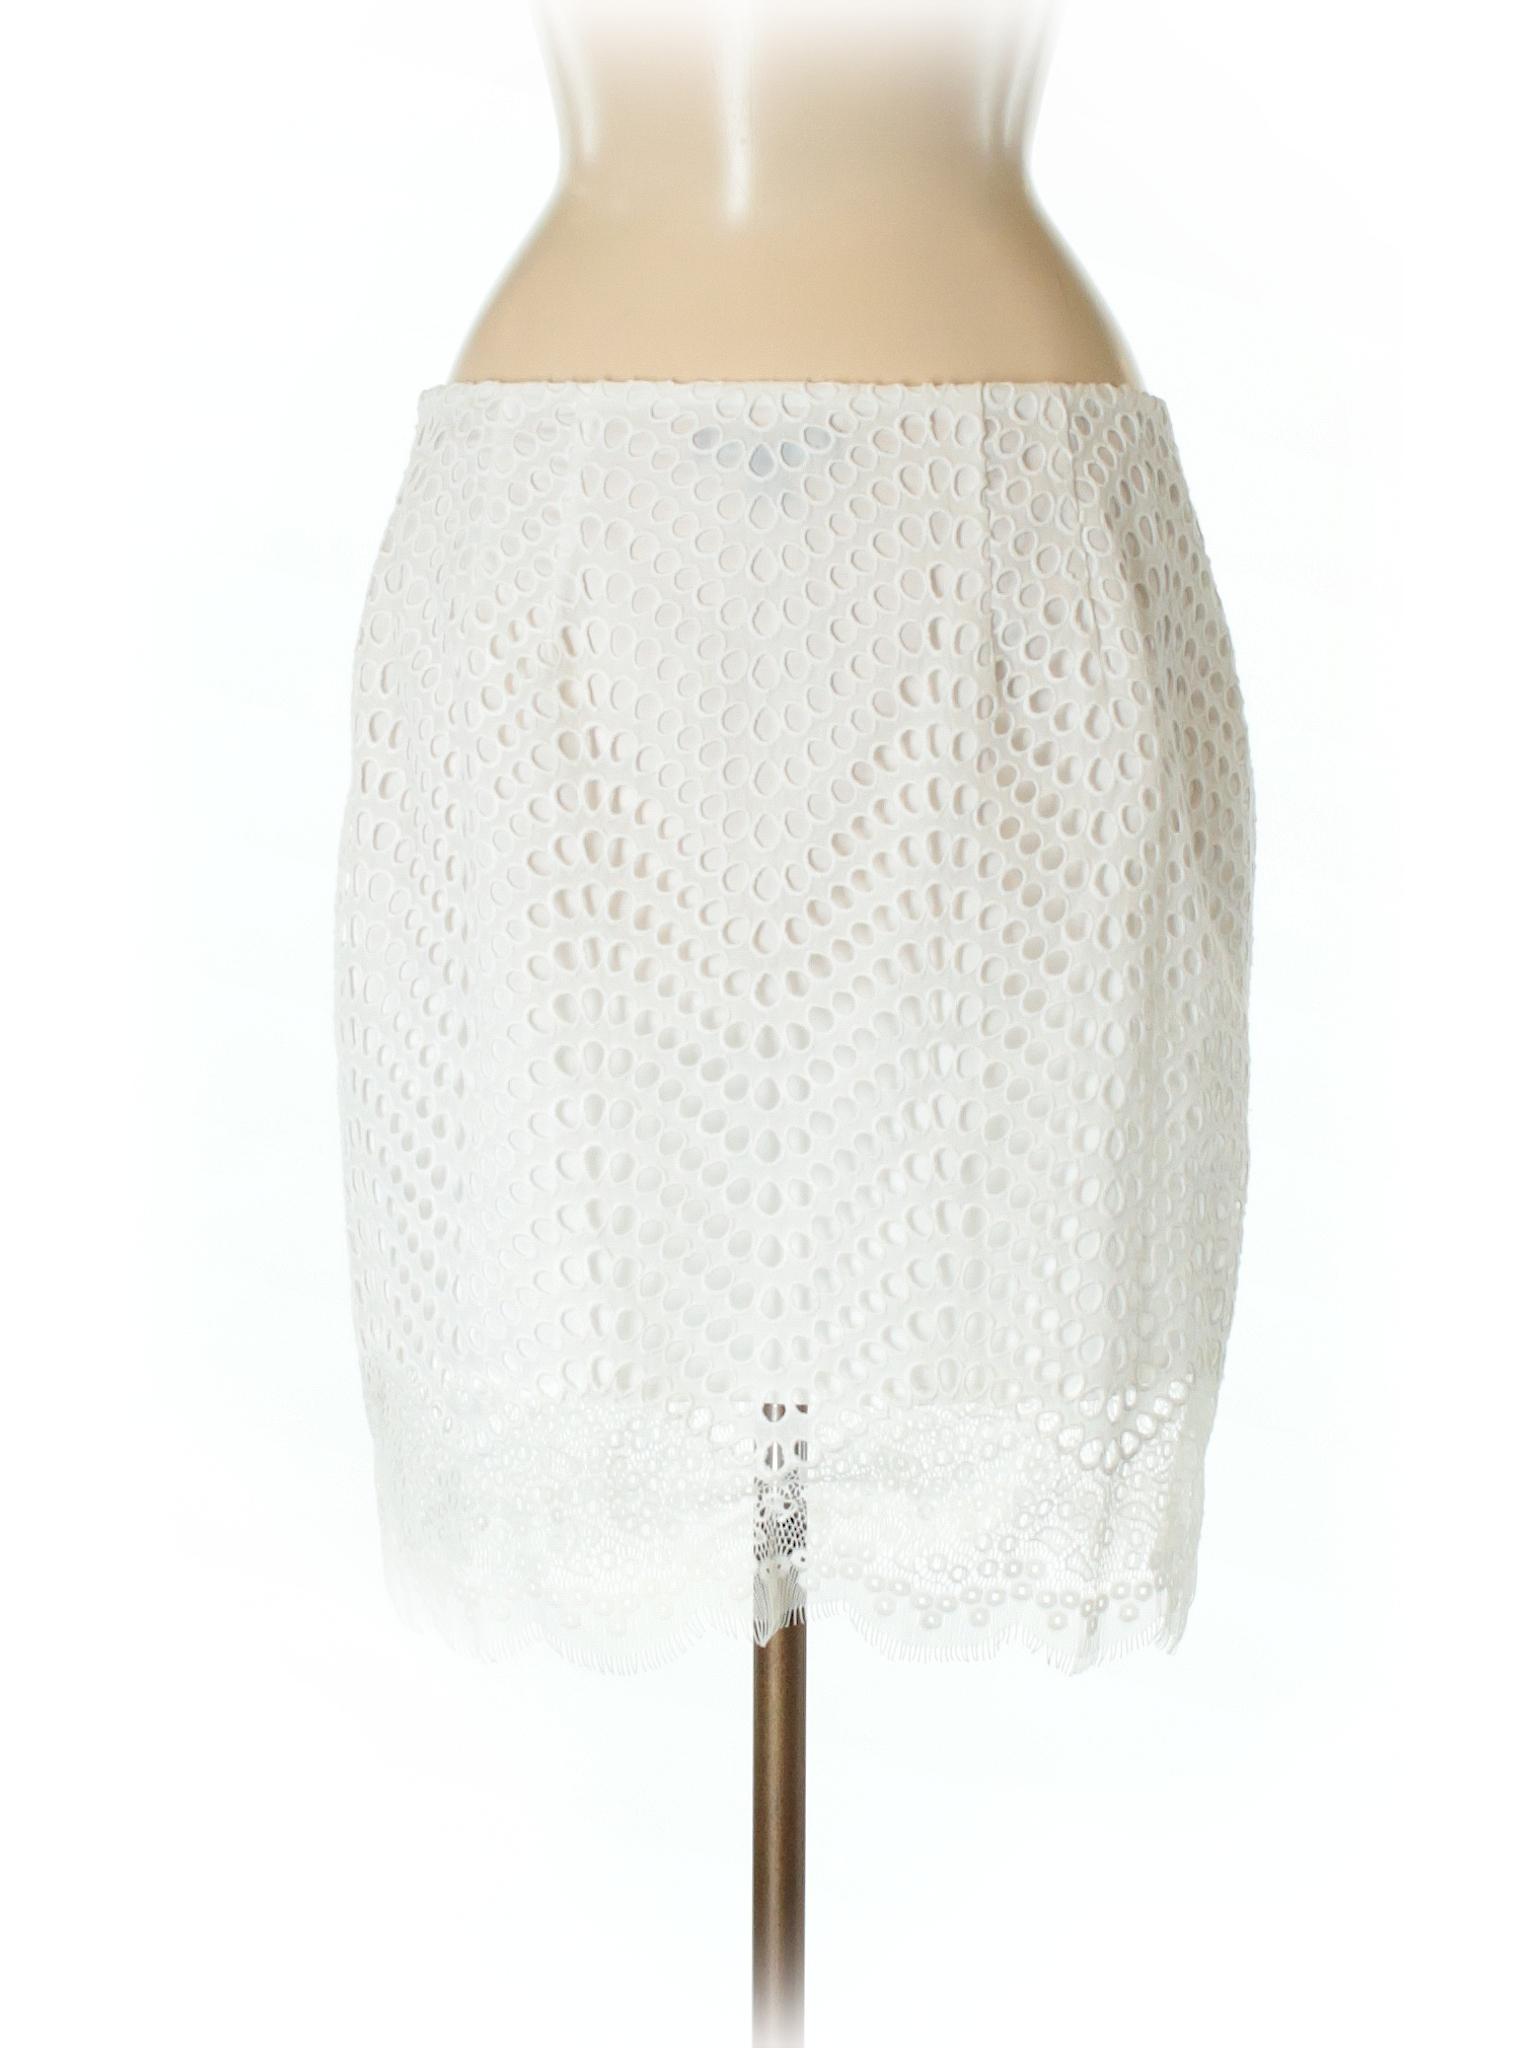 Boutique Skirt Taylor Ann Boutique Casual Ann BHw0RxBqP